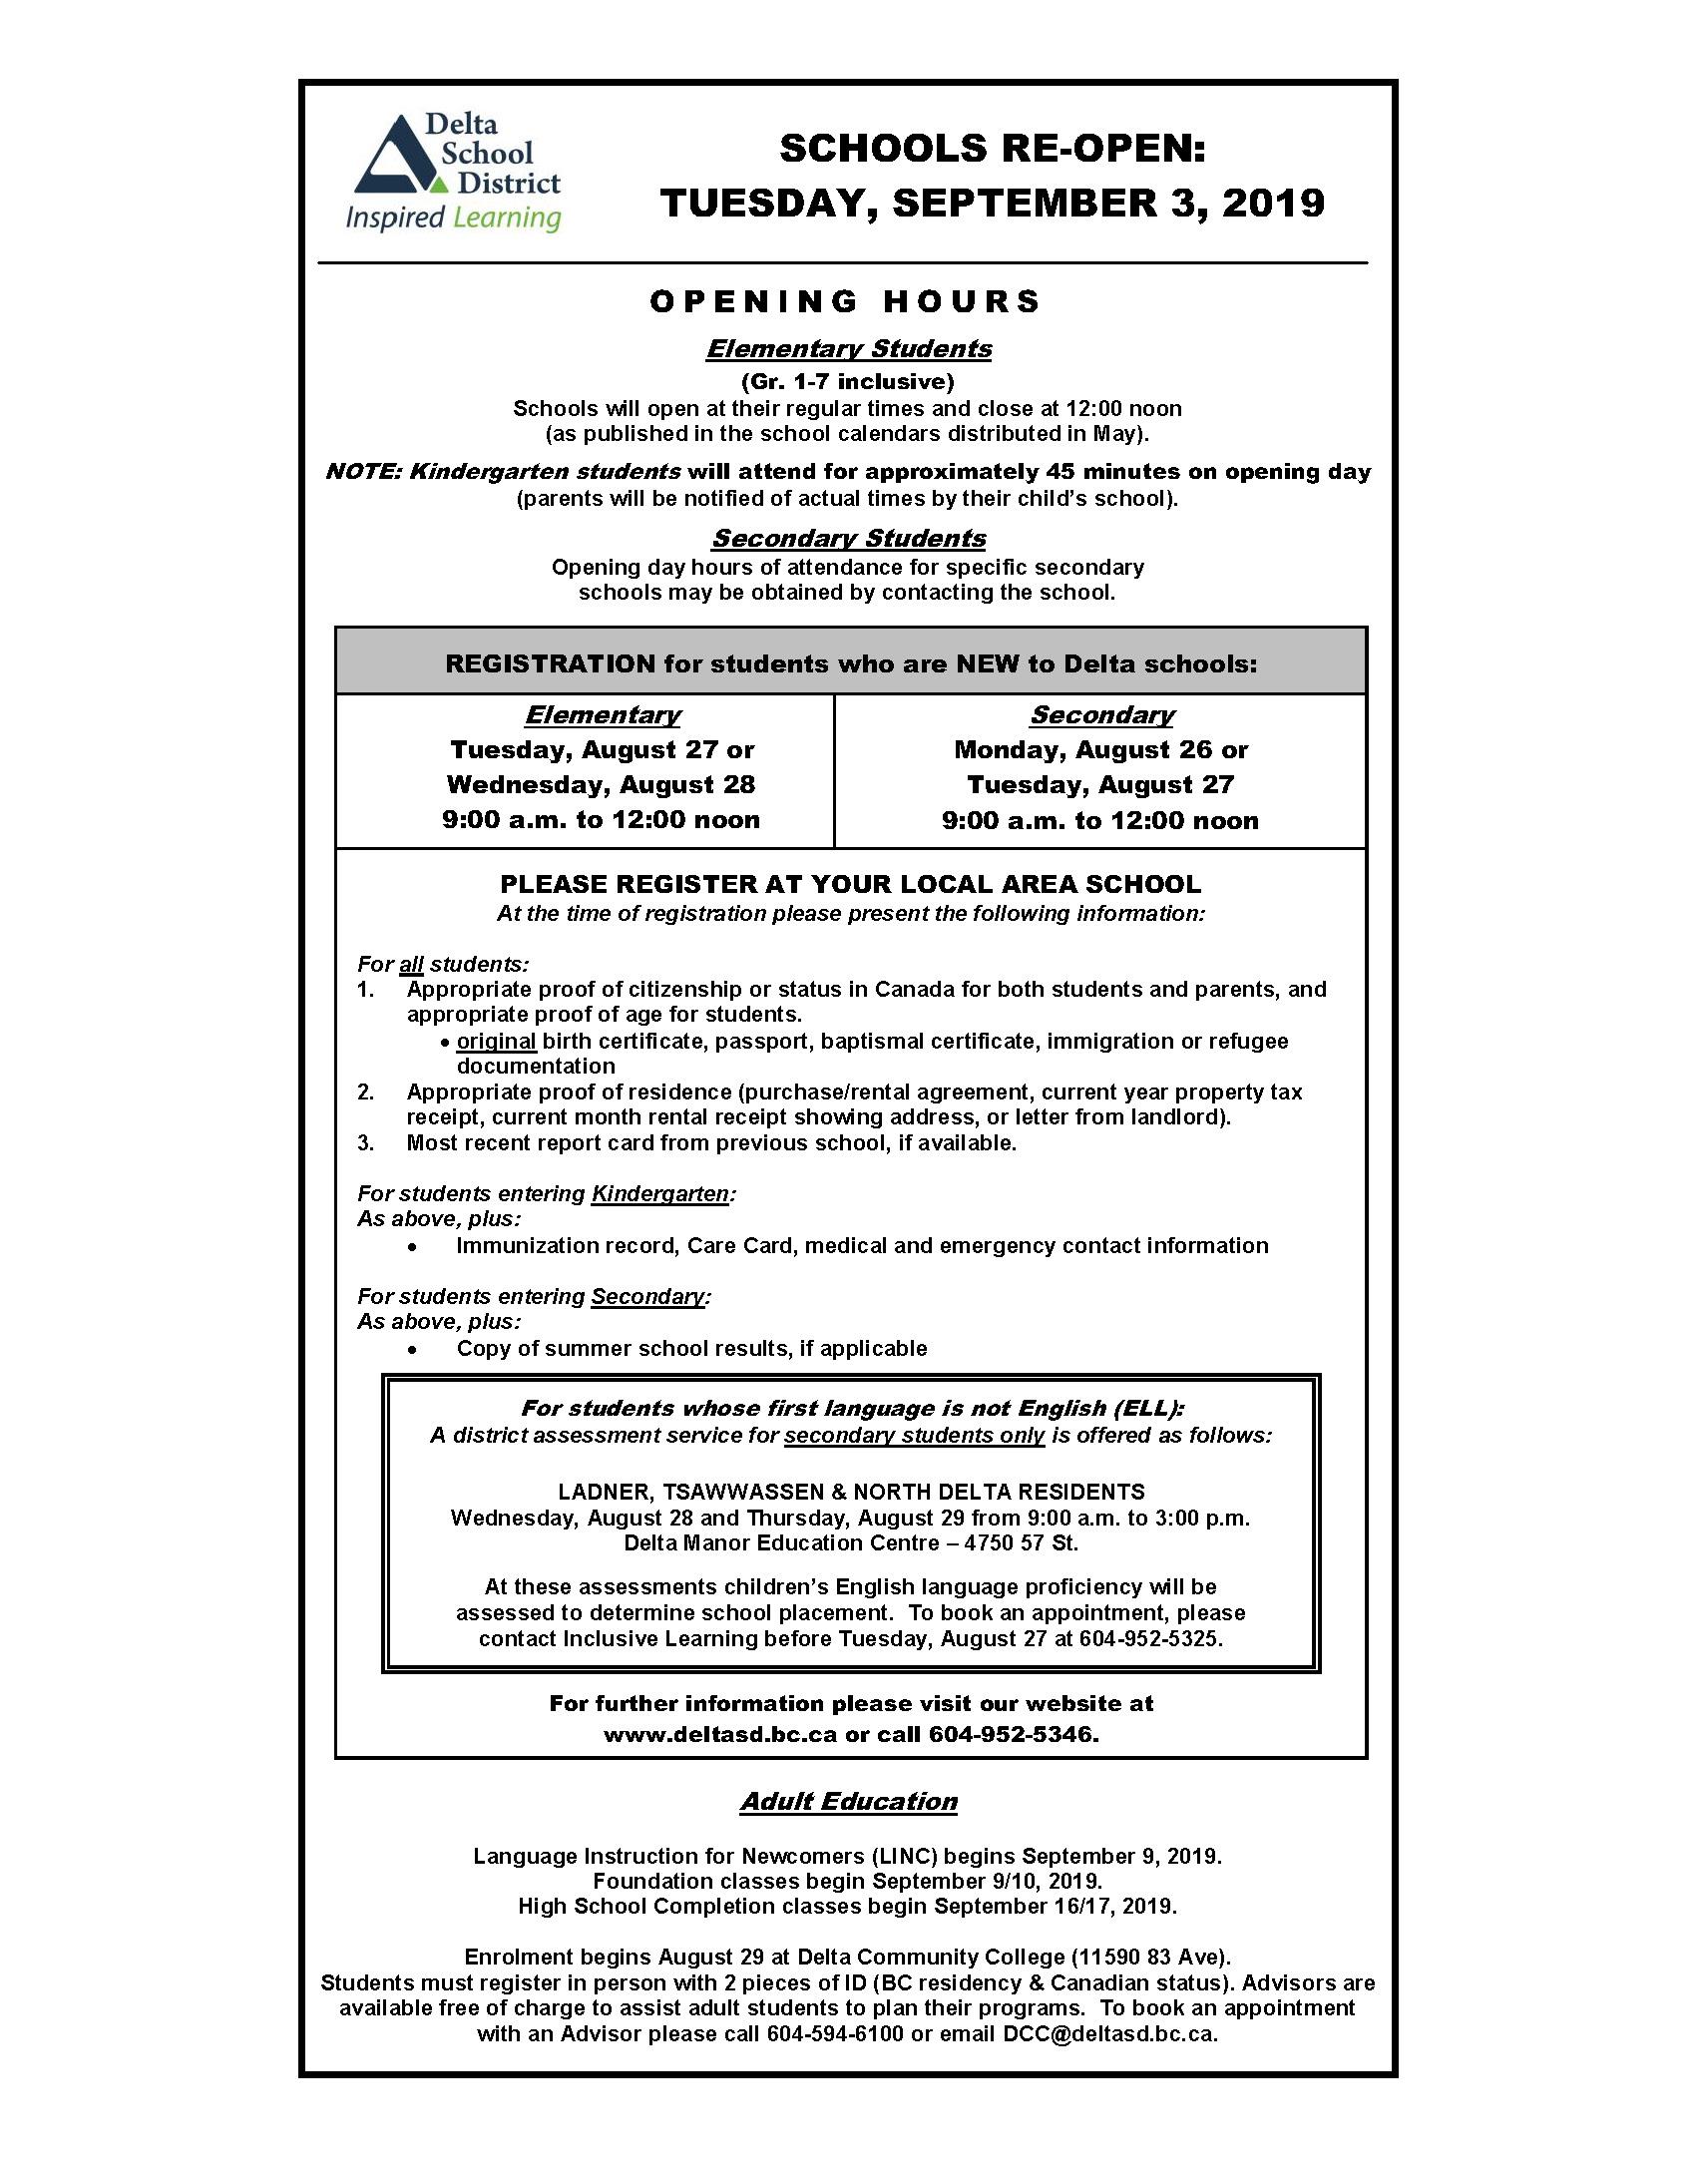 Back to School Opening Hours & Registration Info - Delta School District